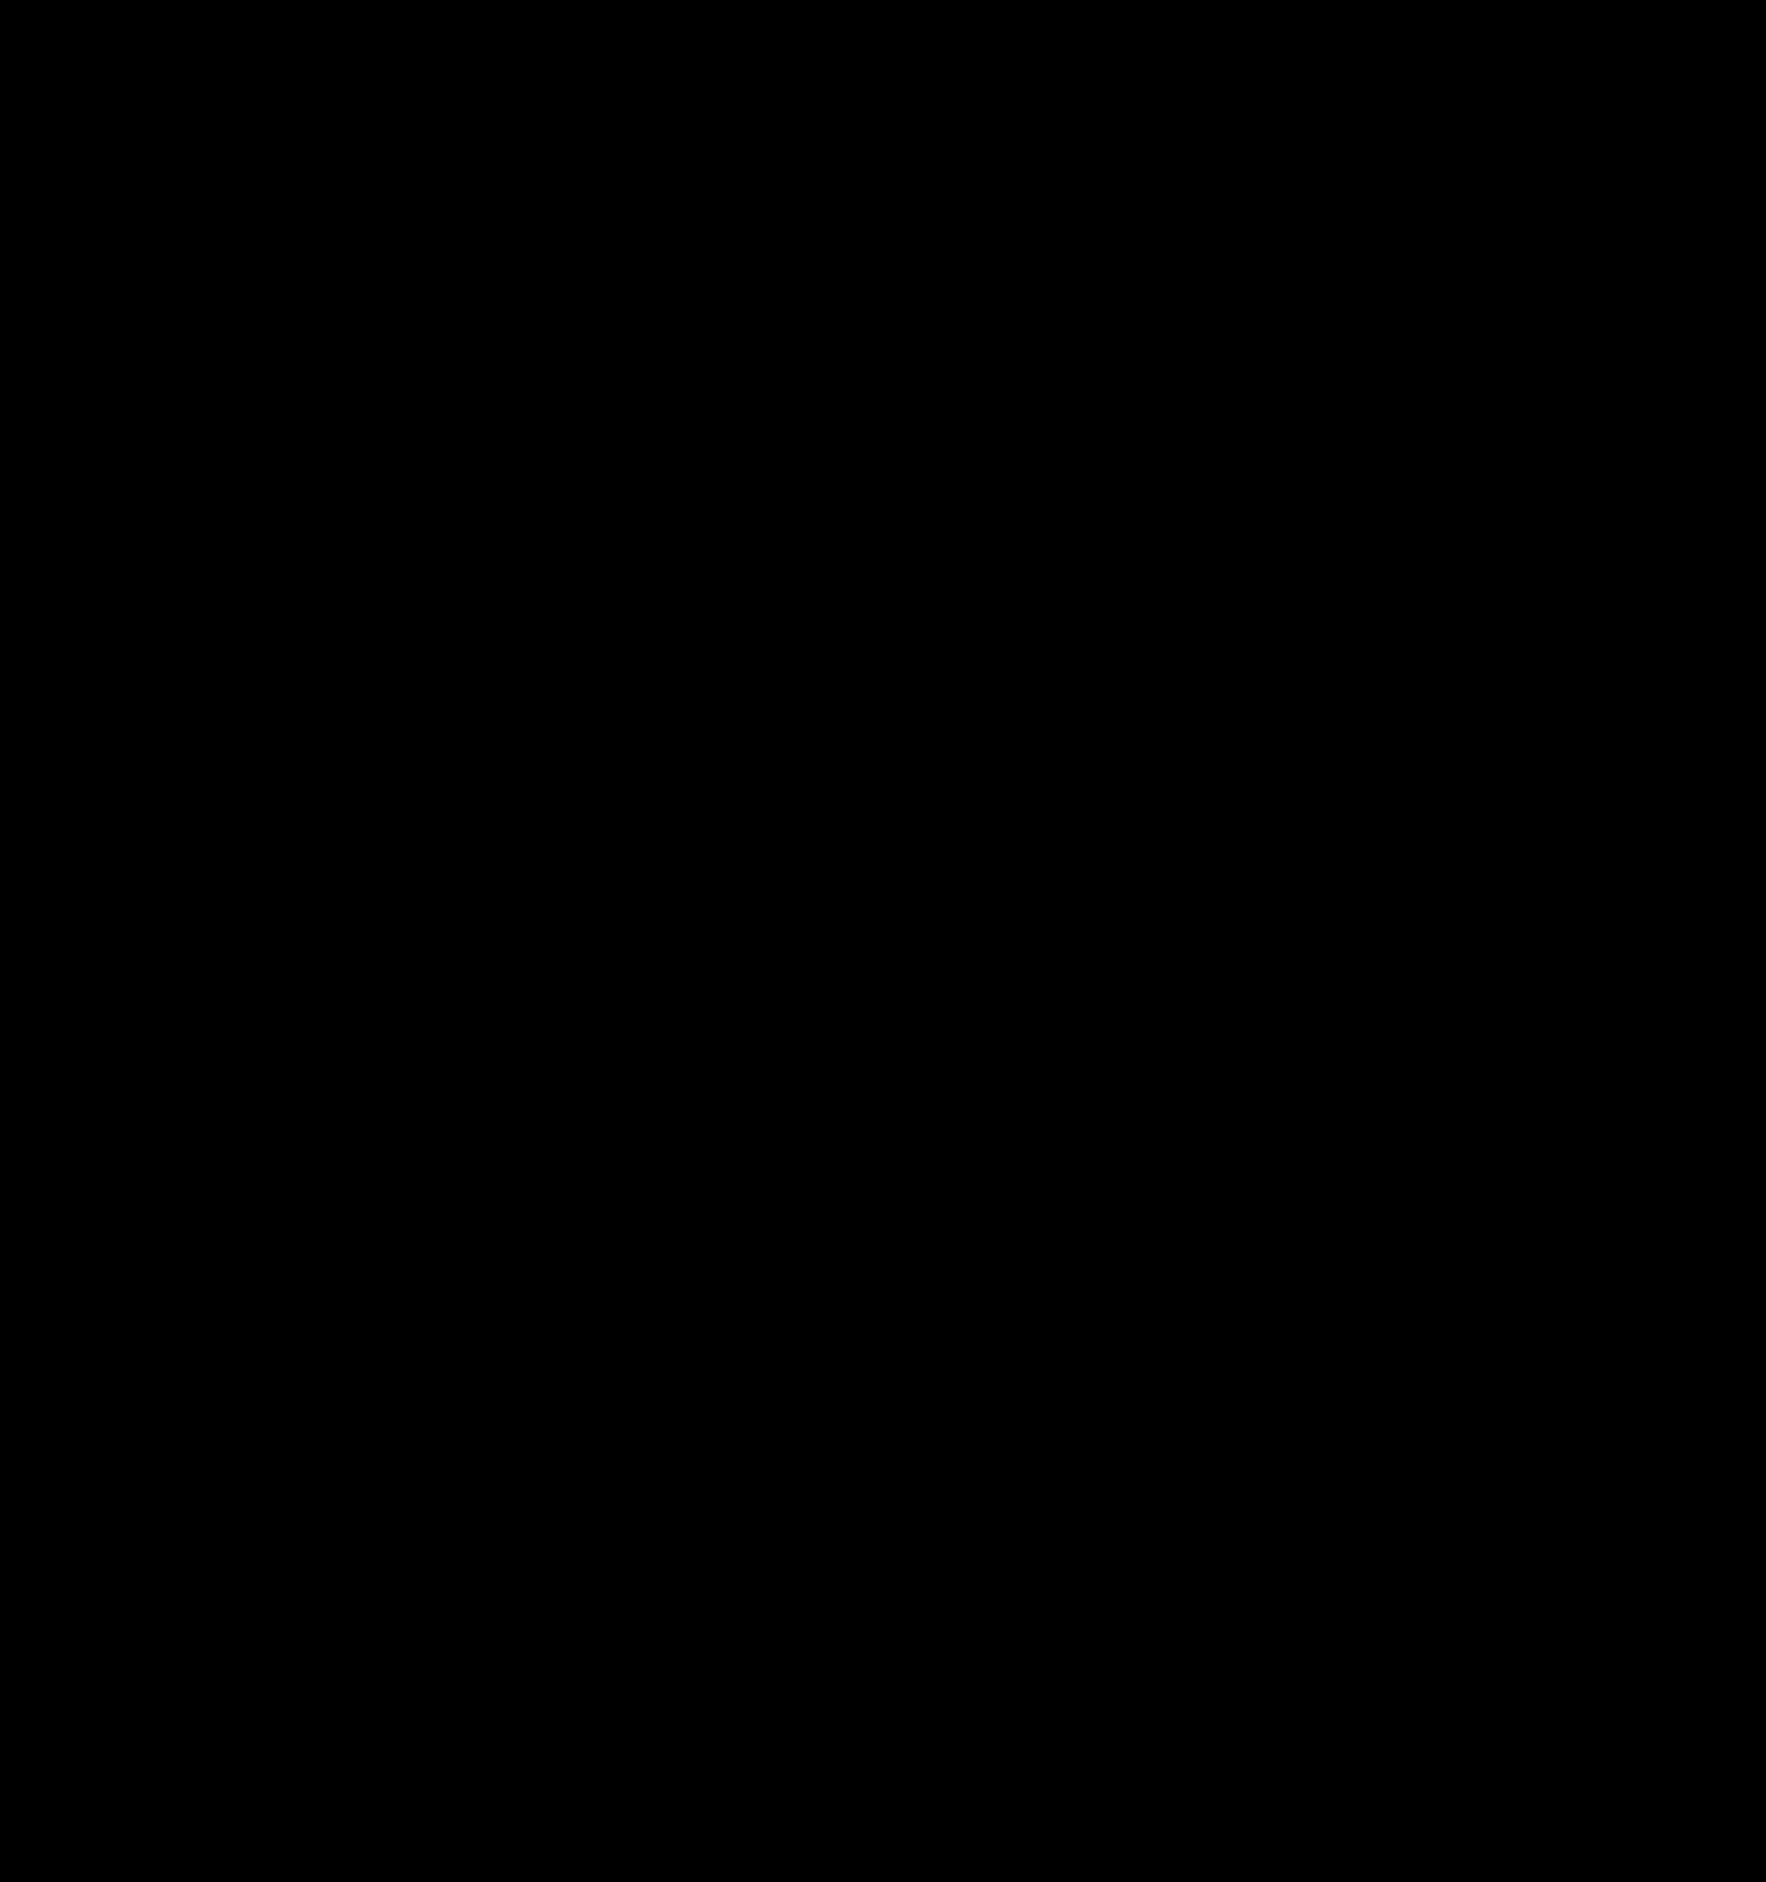 TENSTICKERS. 頭蓋骨付き引用ハロウィン壁デカール. 頭蓋骨と恐ろしい引用が特徴のハロウィンビニールデカールデザイン。引用は「これはすべての魔女がハロウィンの夜になるときです。